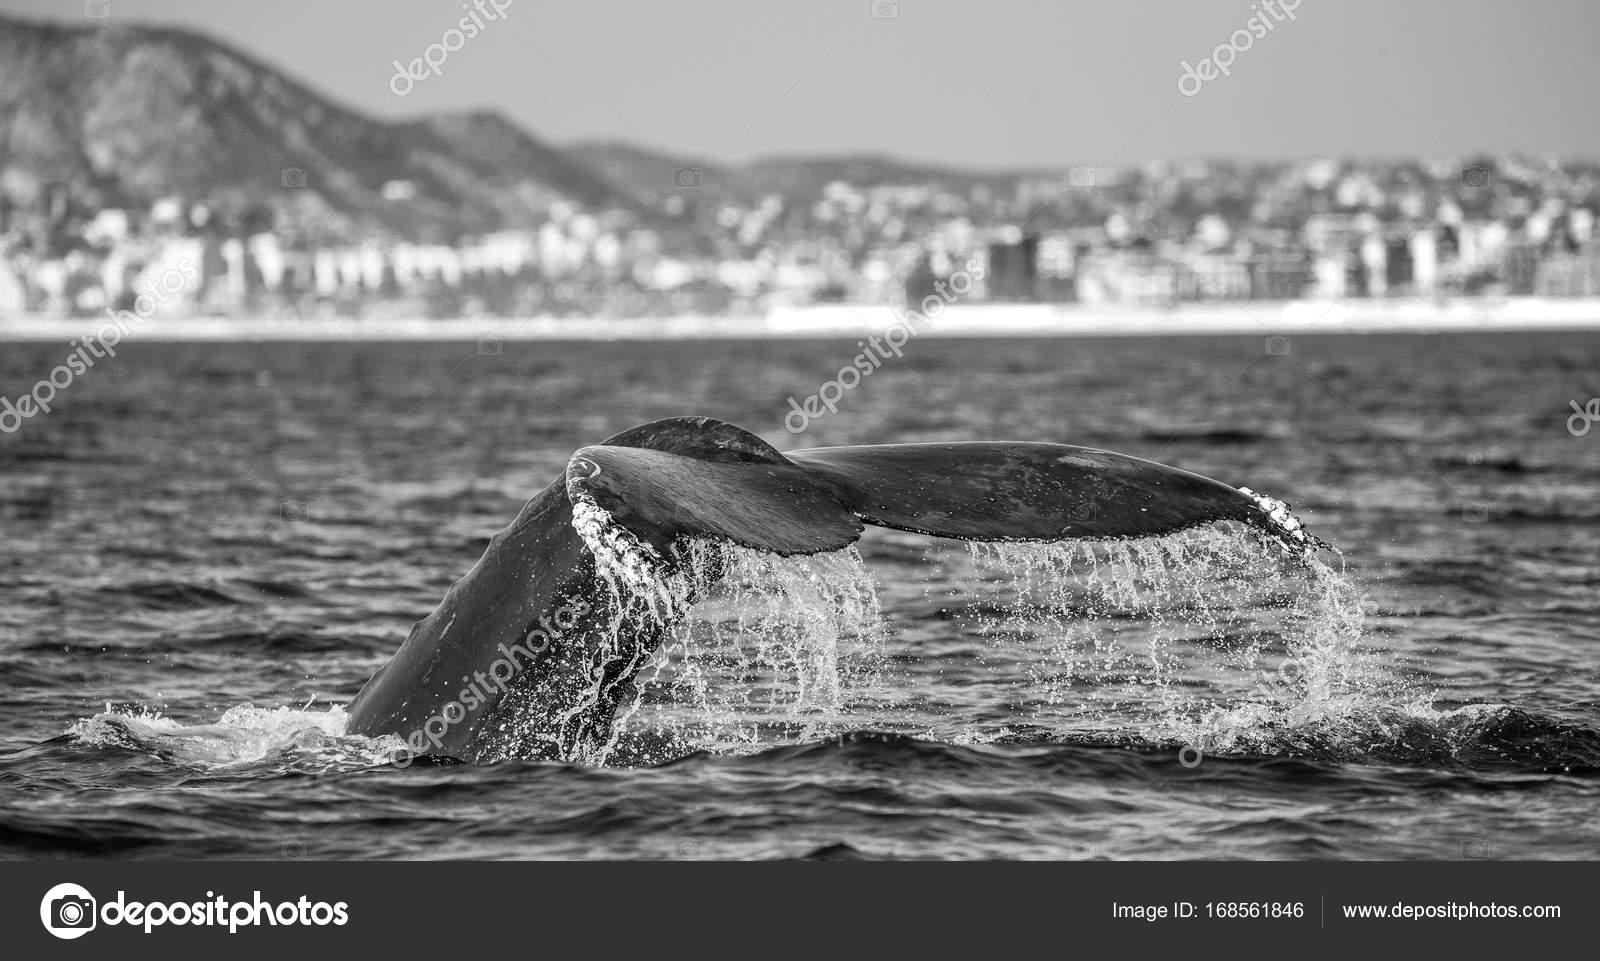 Vasca Da Bagno Balenottera : Coda di balena megattera u foto stock gudkovandrey